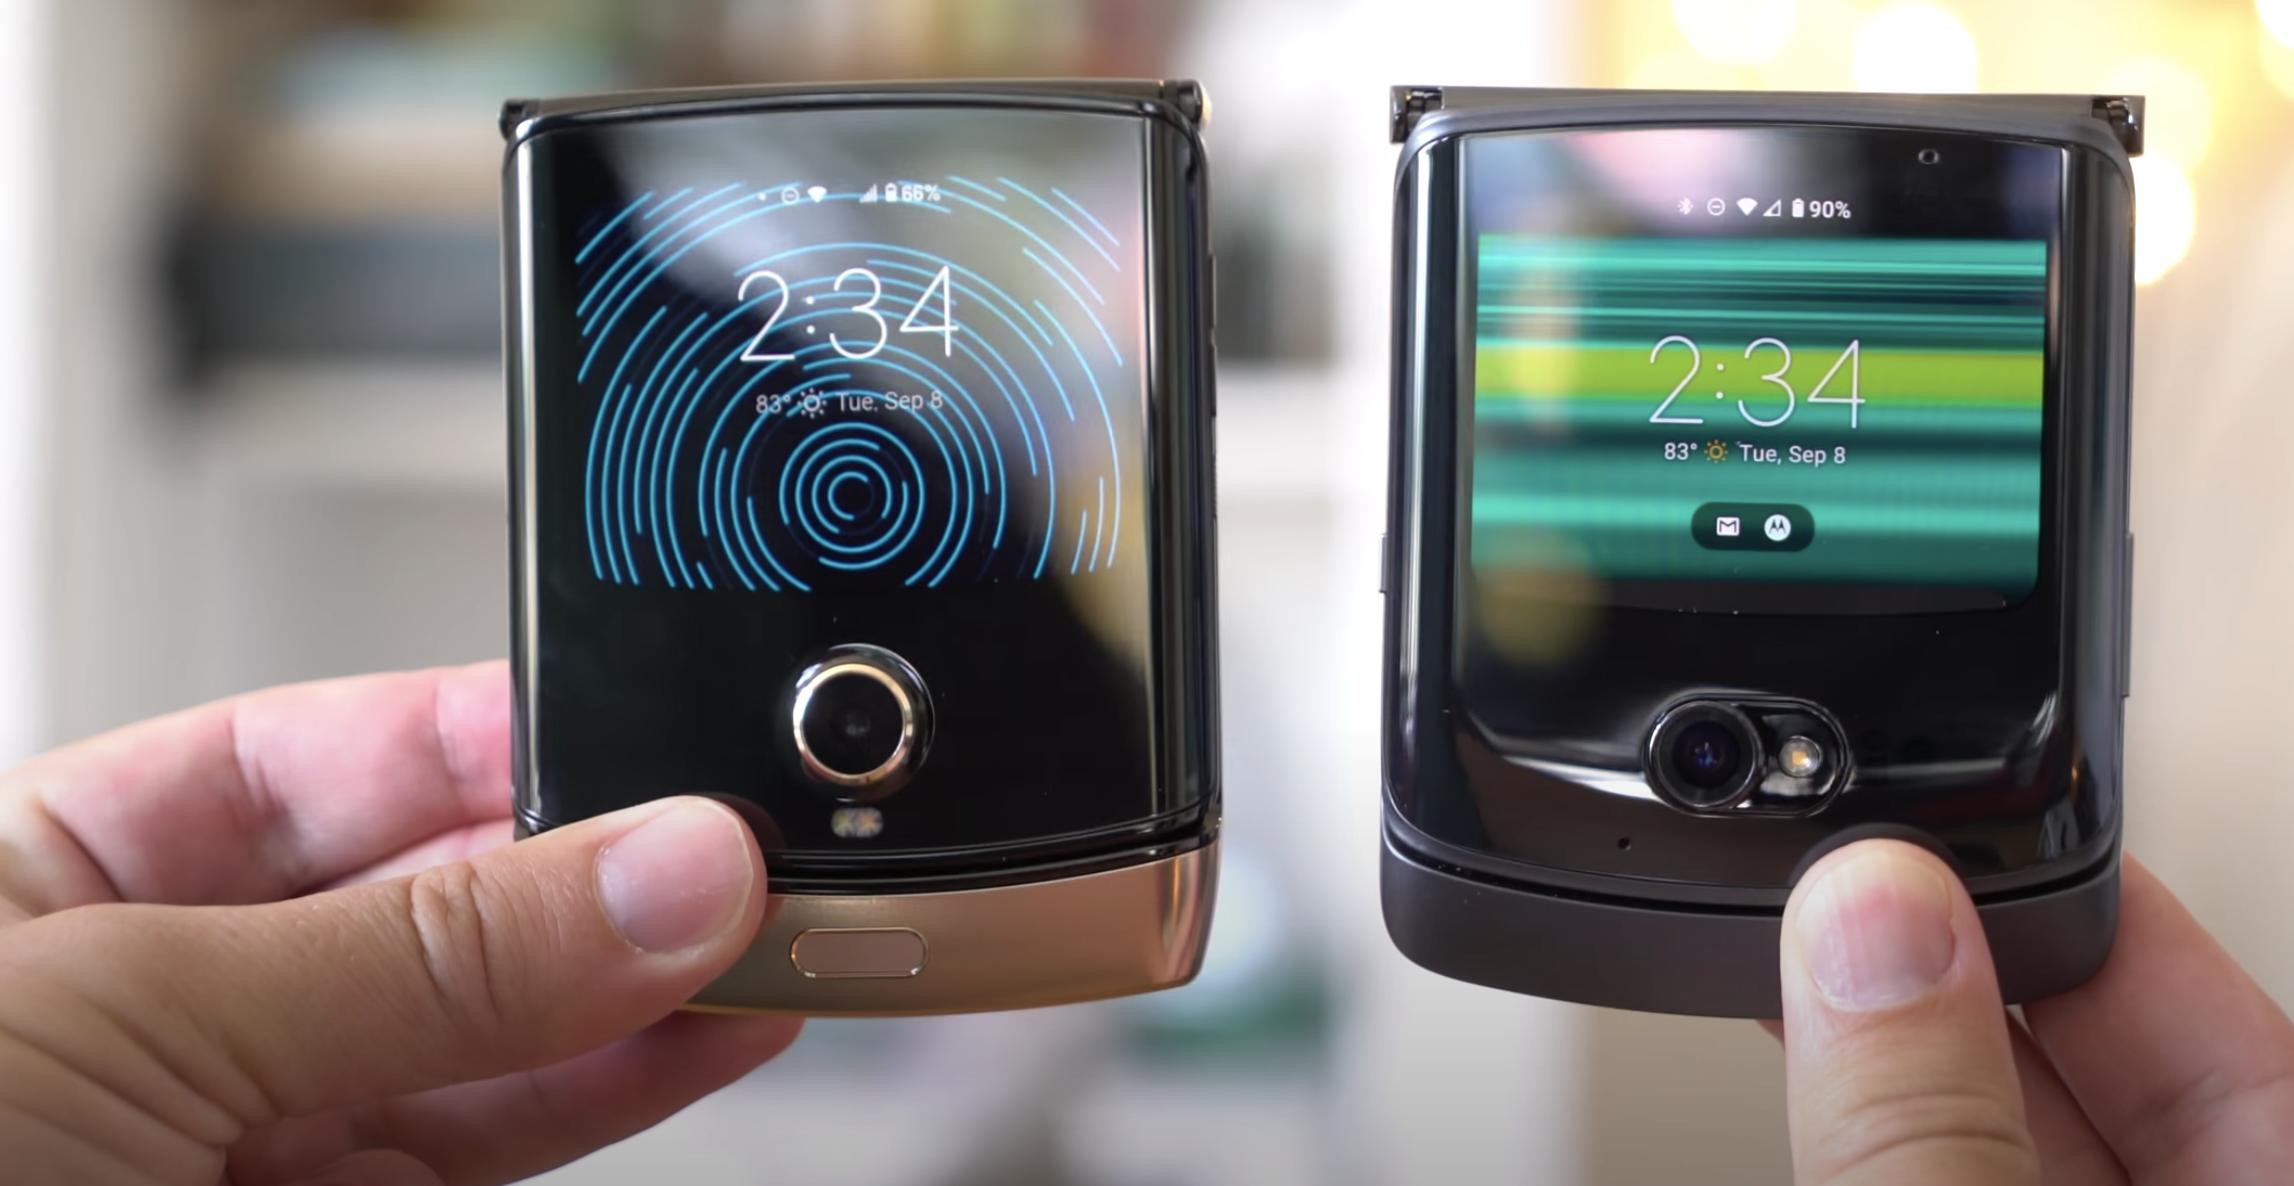 Moto Razr 5G first impressions roundup: A slightly improved novelty – 9to5Google